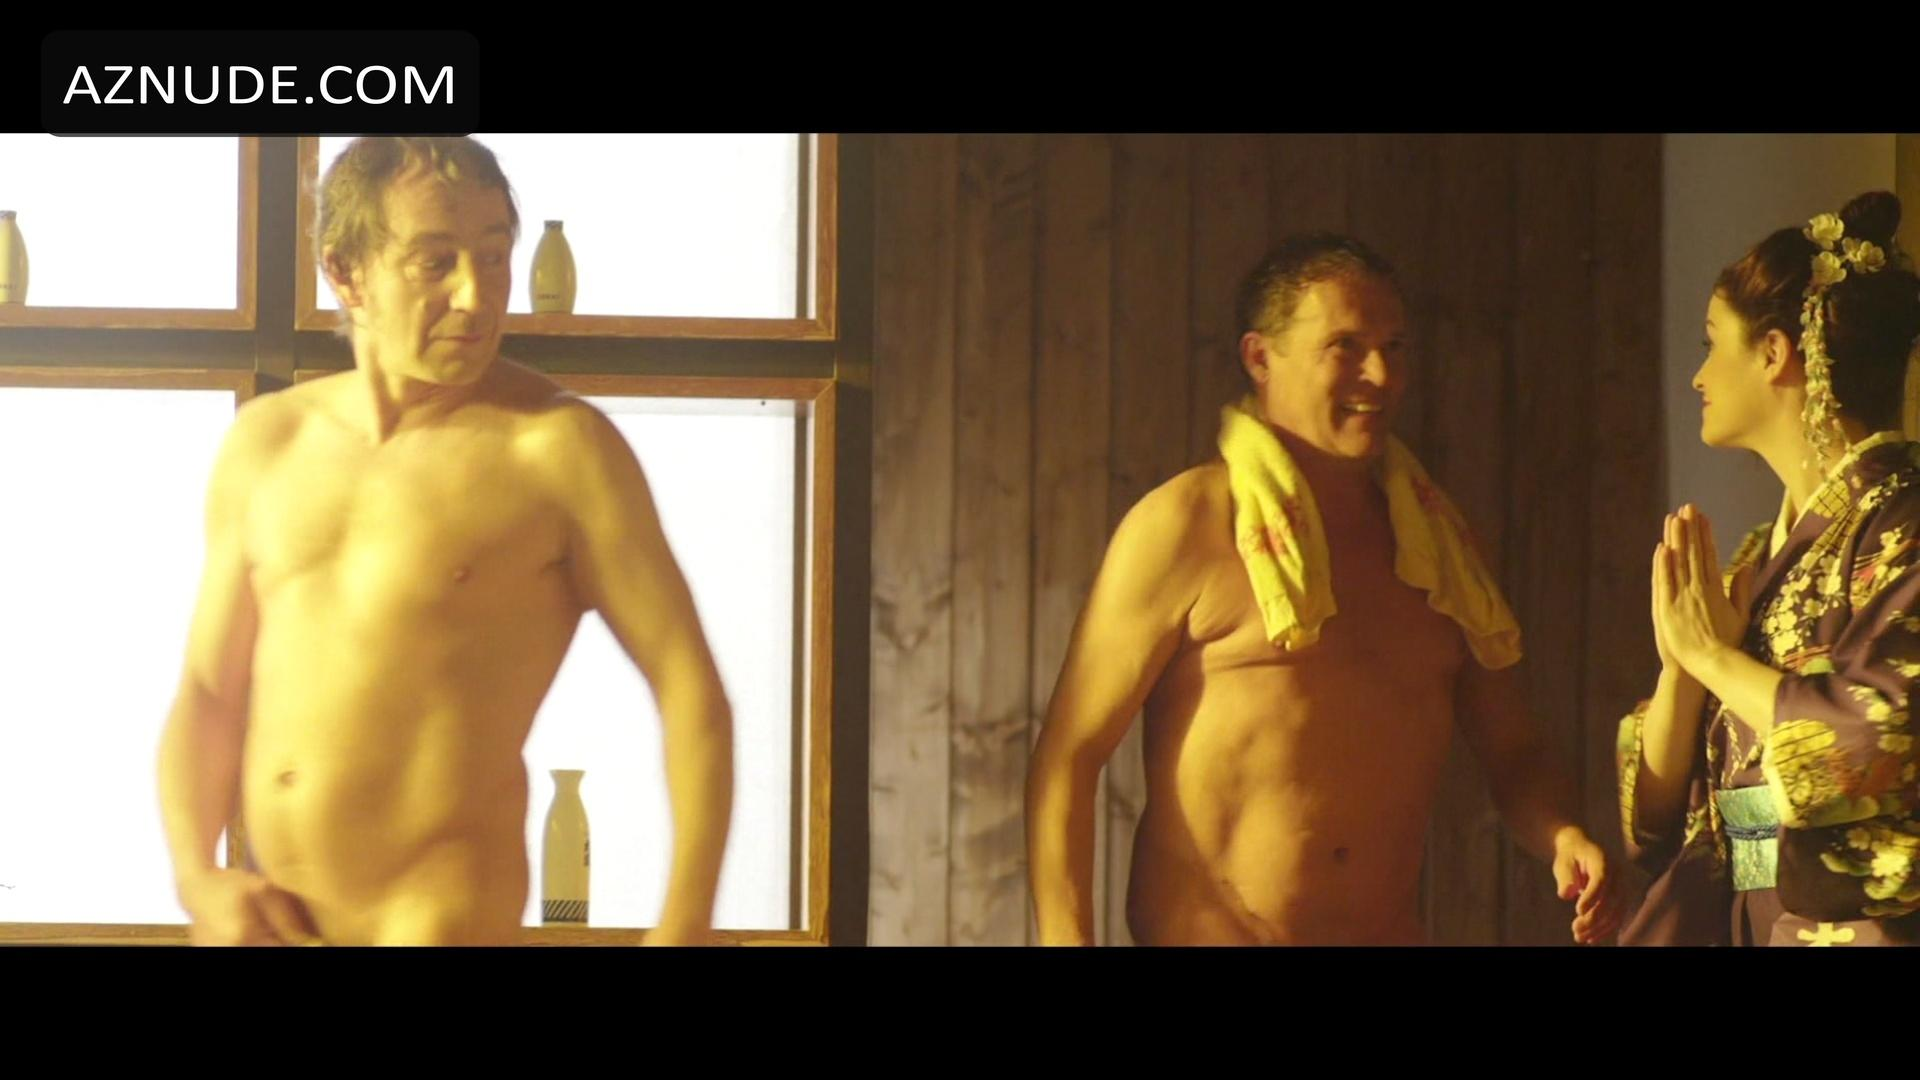 Sushi In Suhl Nude Scenes - Aznude Men-2626